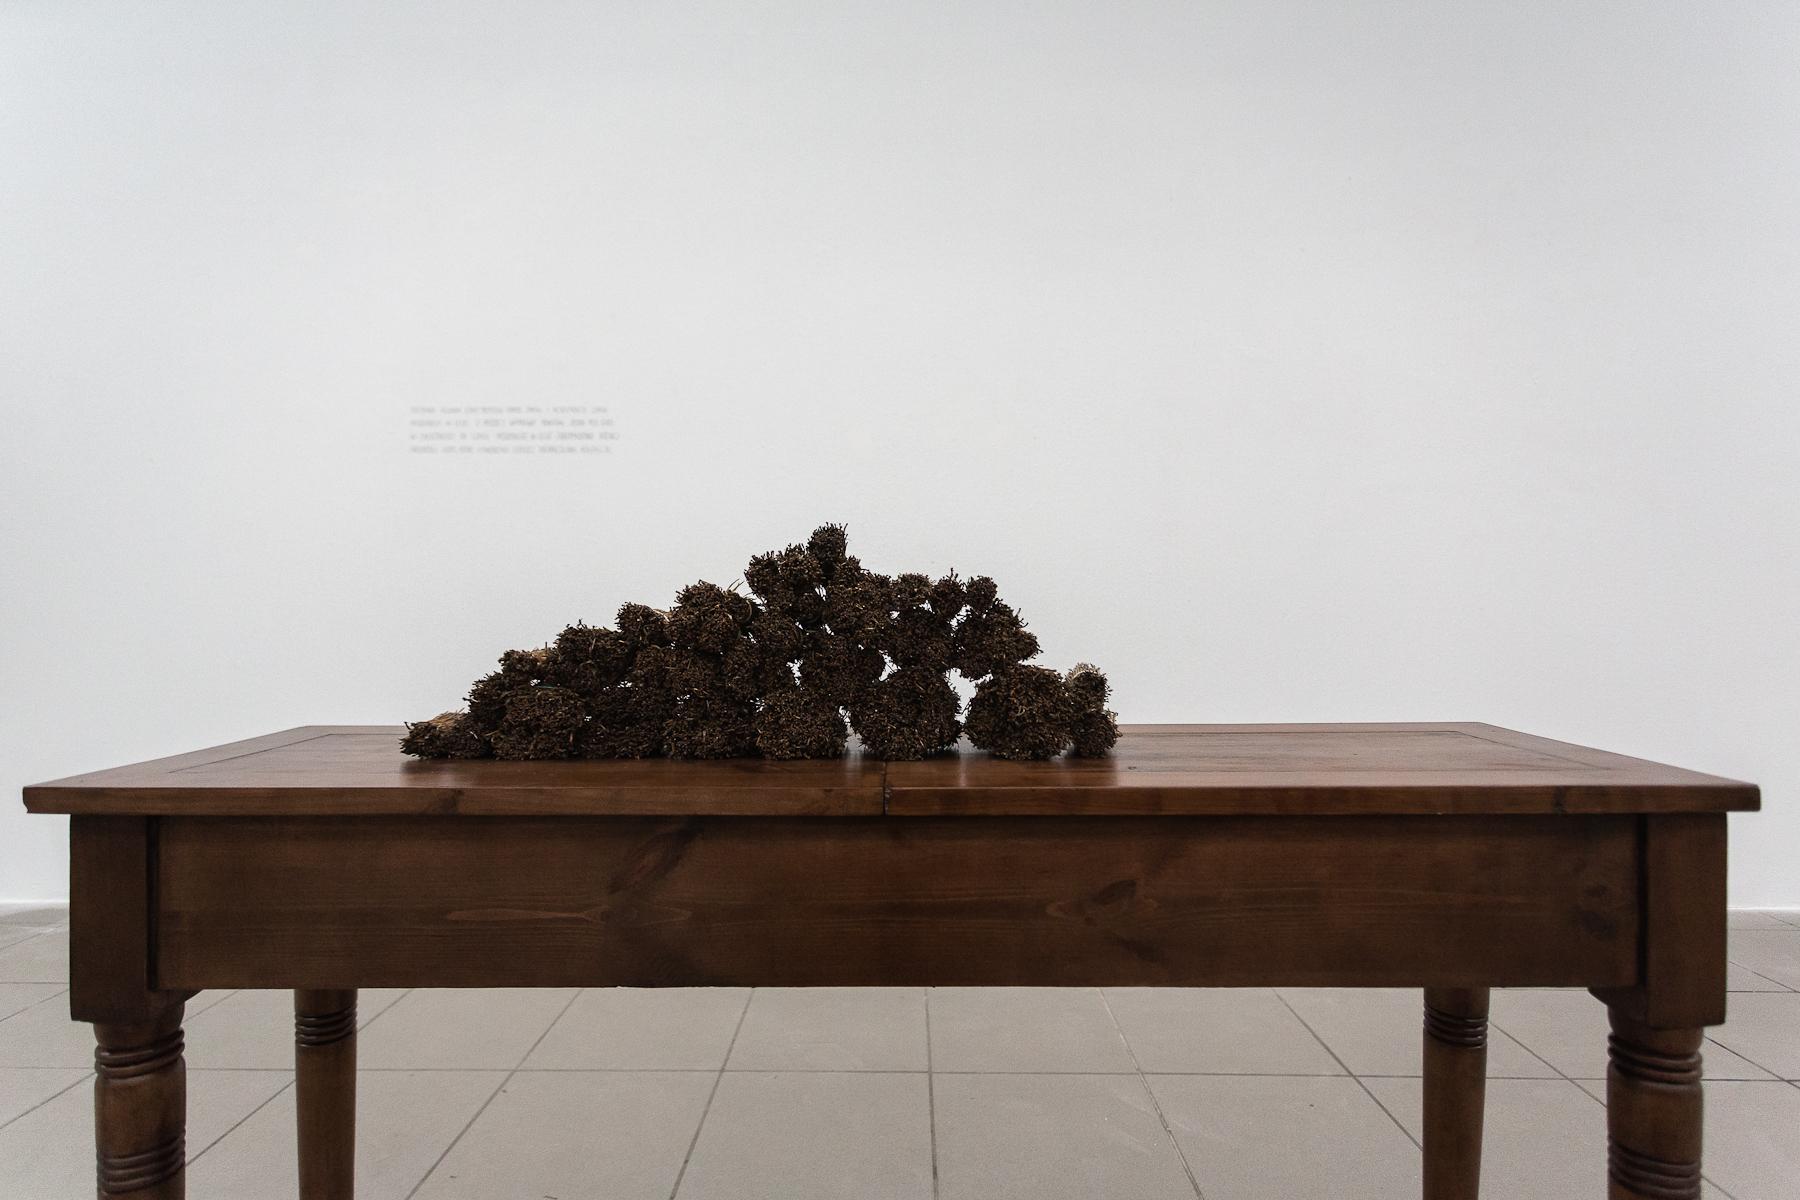 Paweł Szeibel, Pinus sylvestris, instalacja, 2015